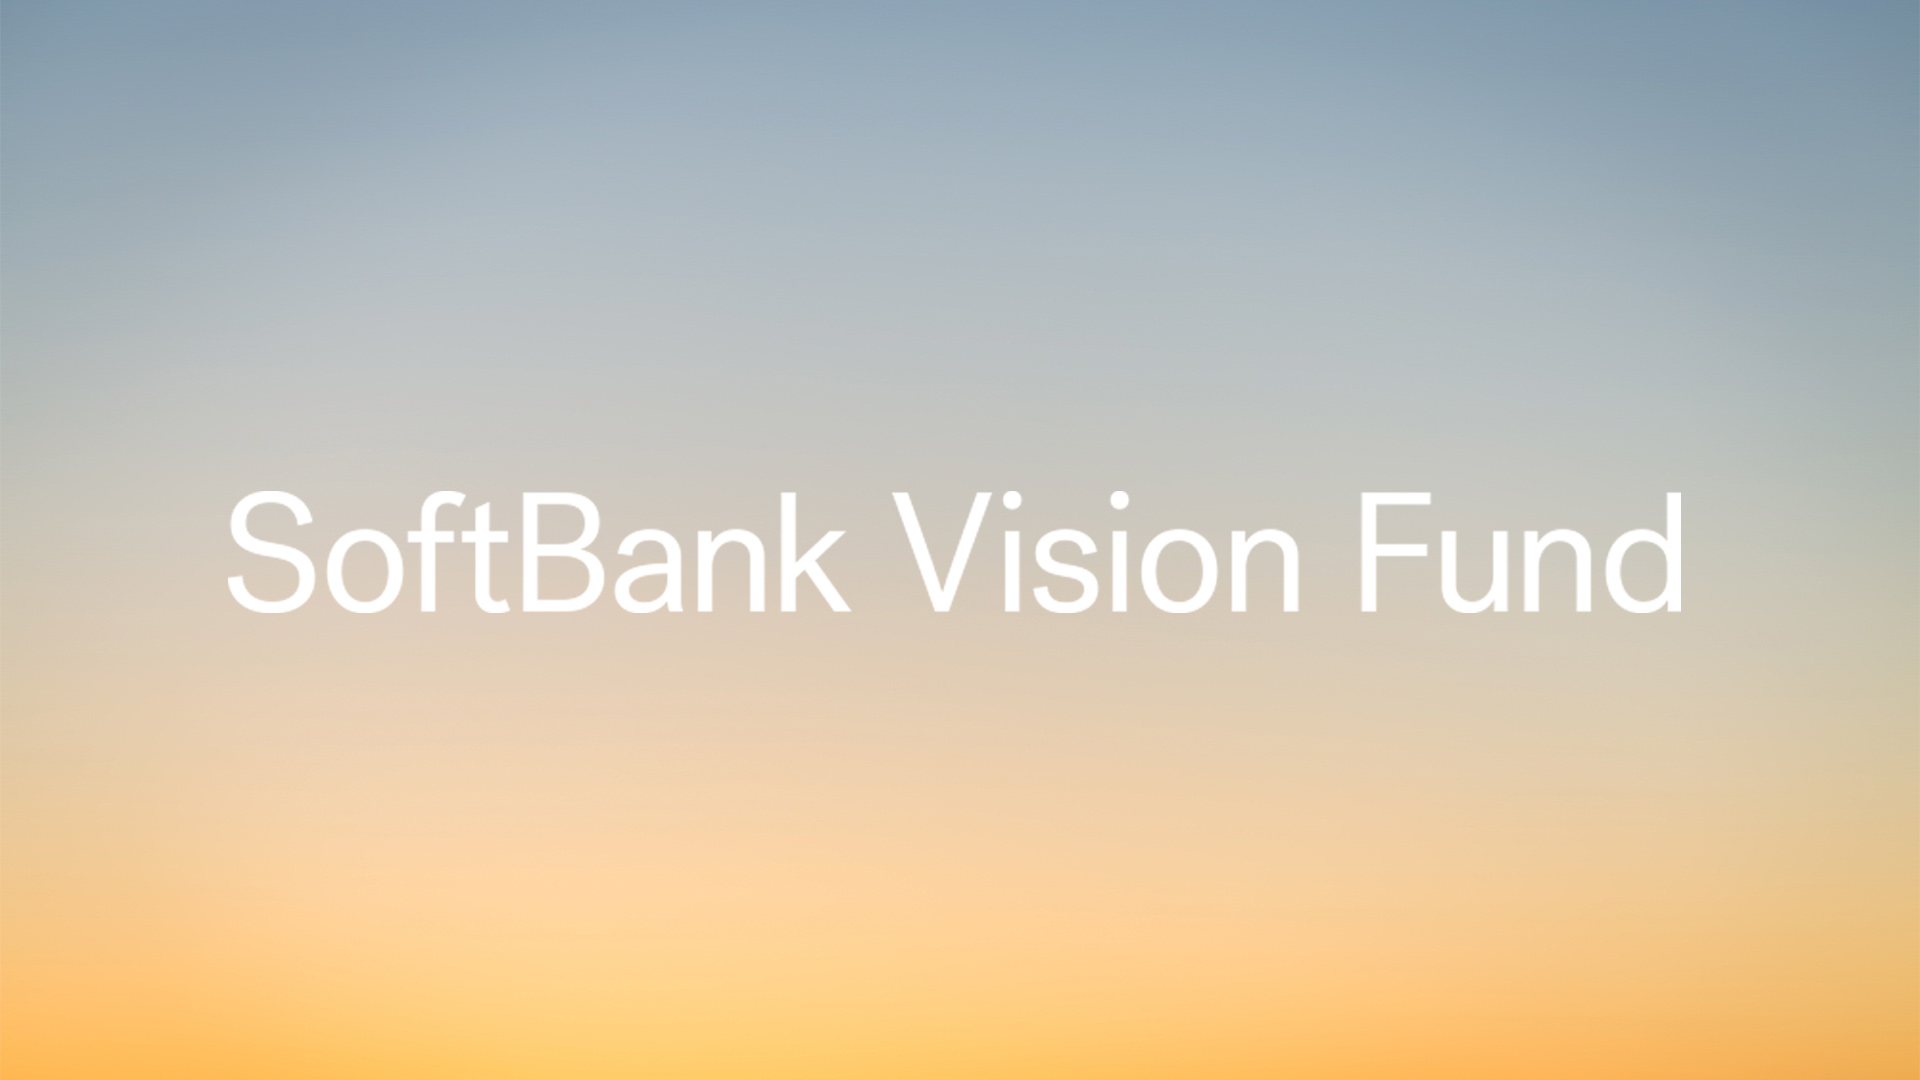 SoftBank Vision Fund – Annalisa Swank